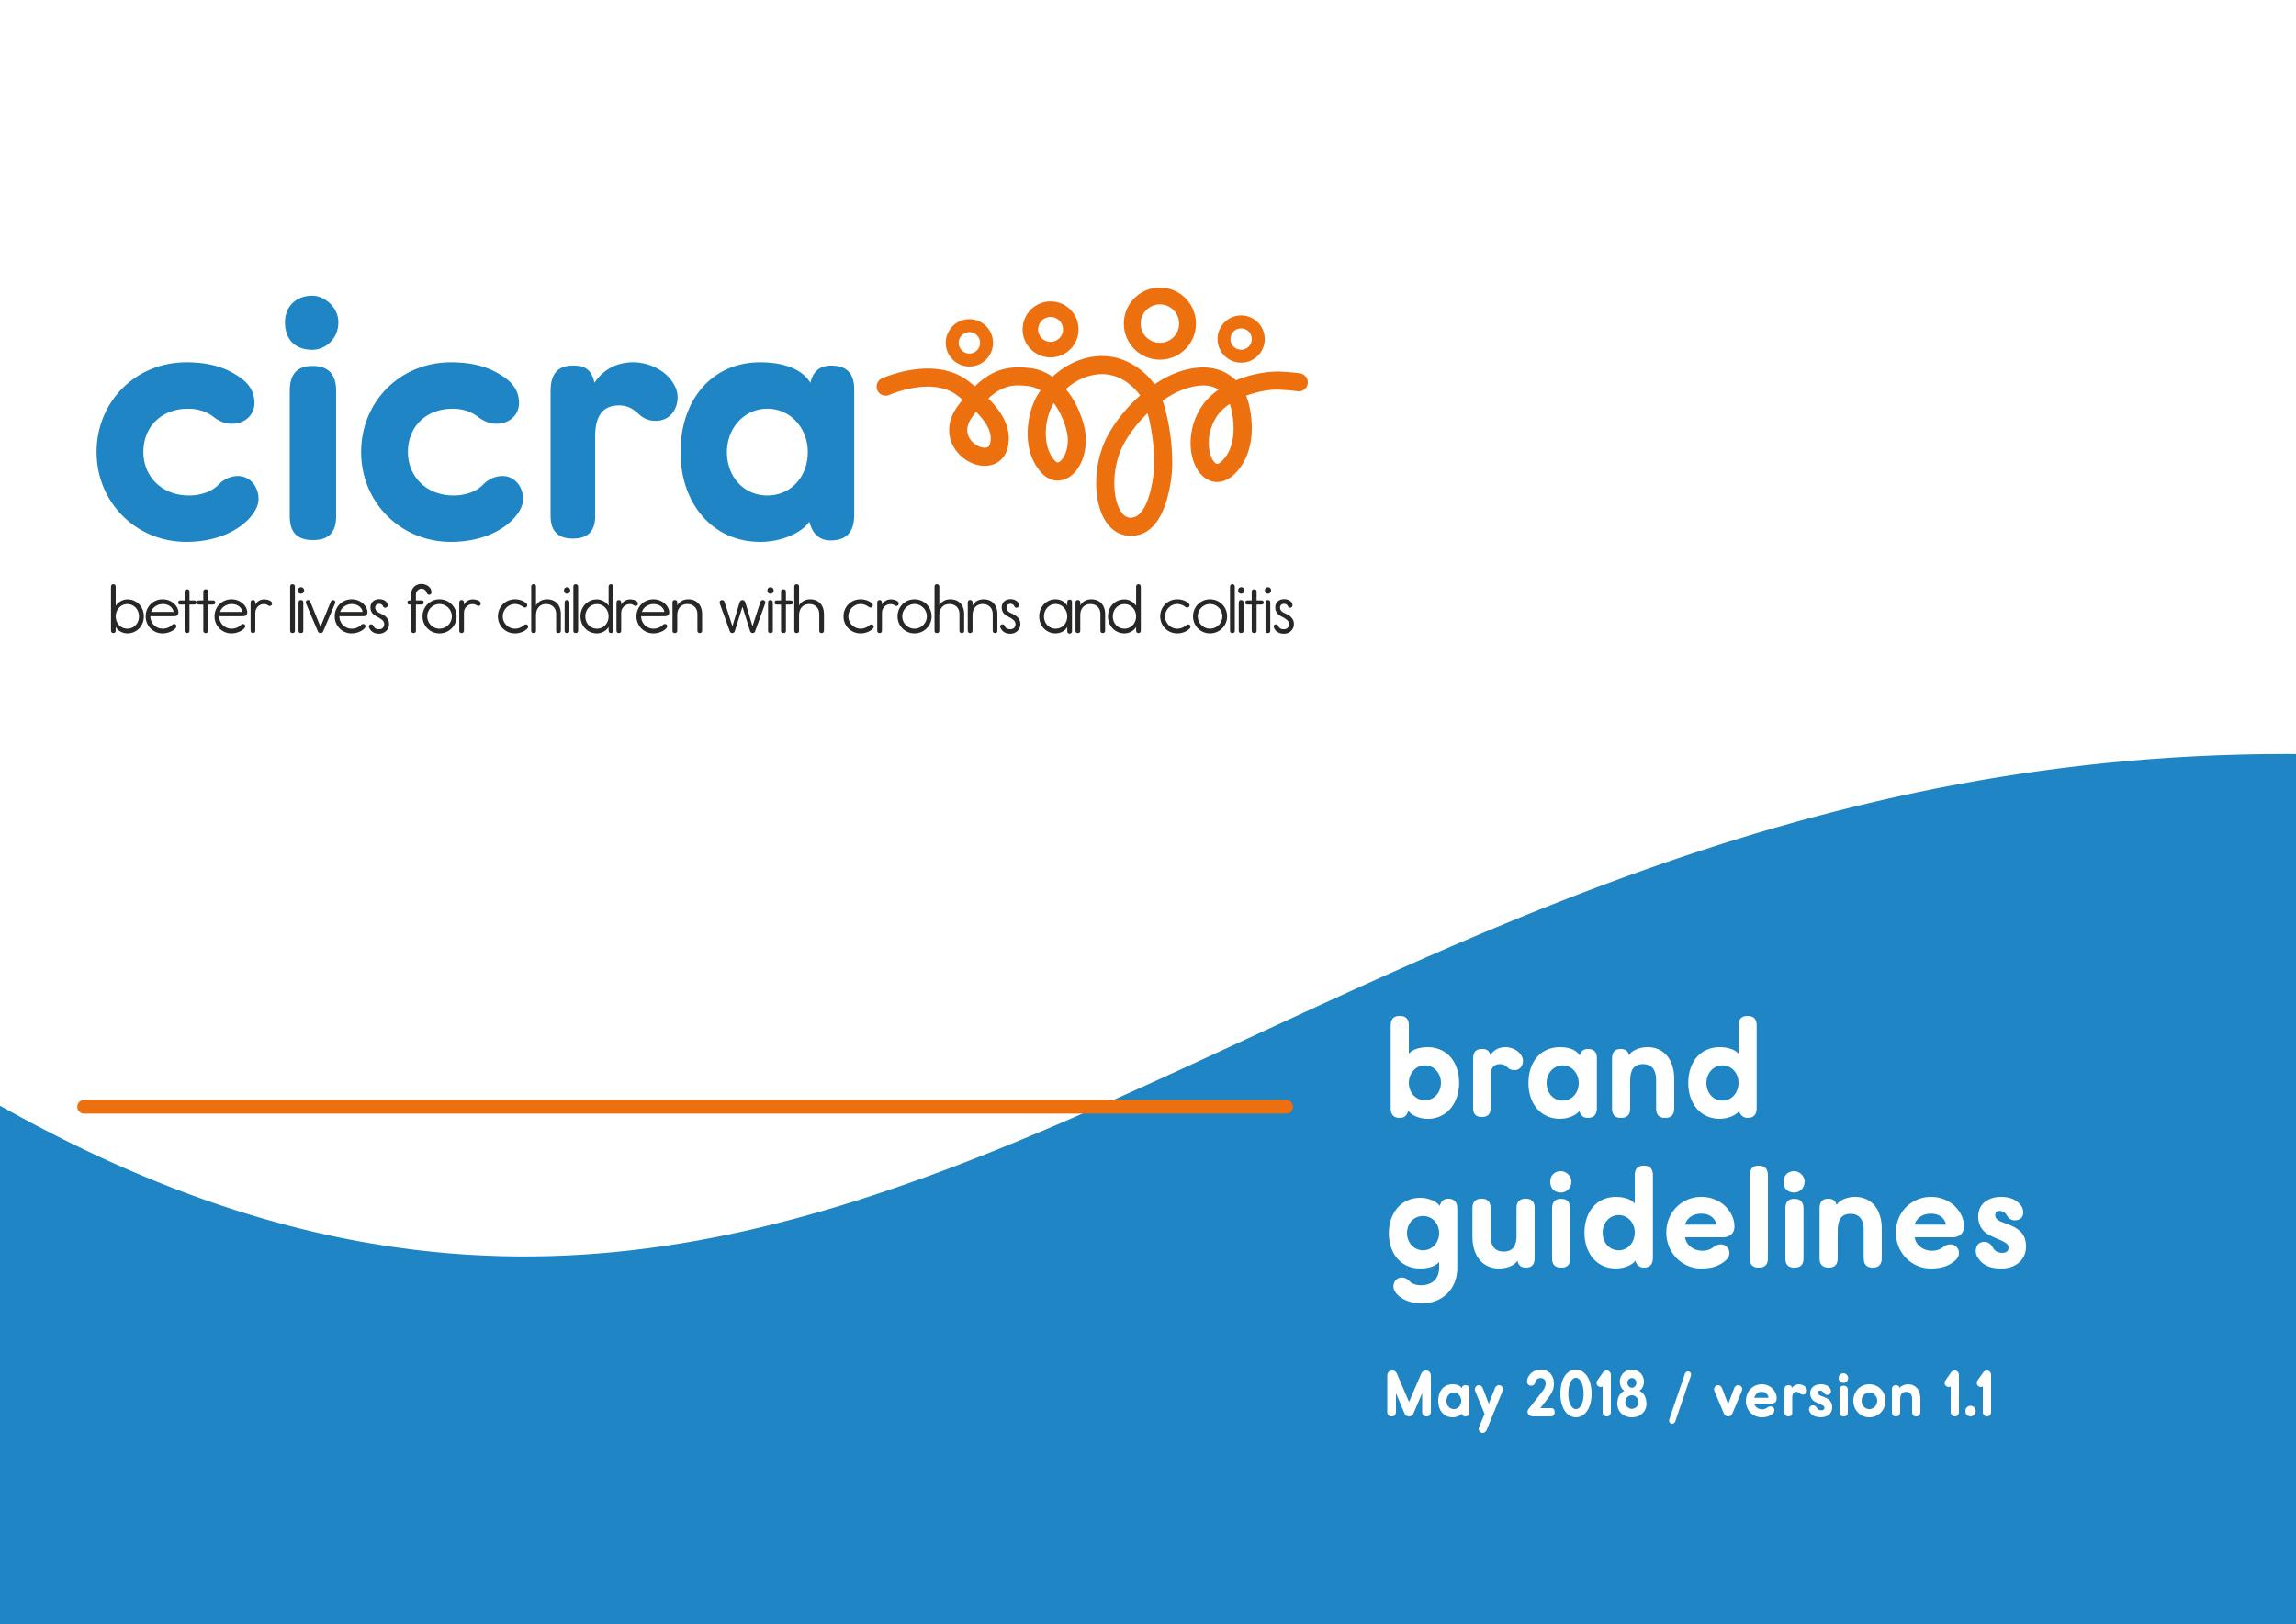 0188 CICRA Brand Guidelines_V1.1-1.jpg